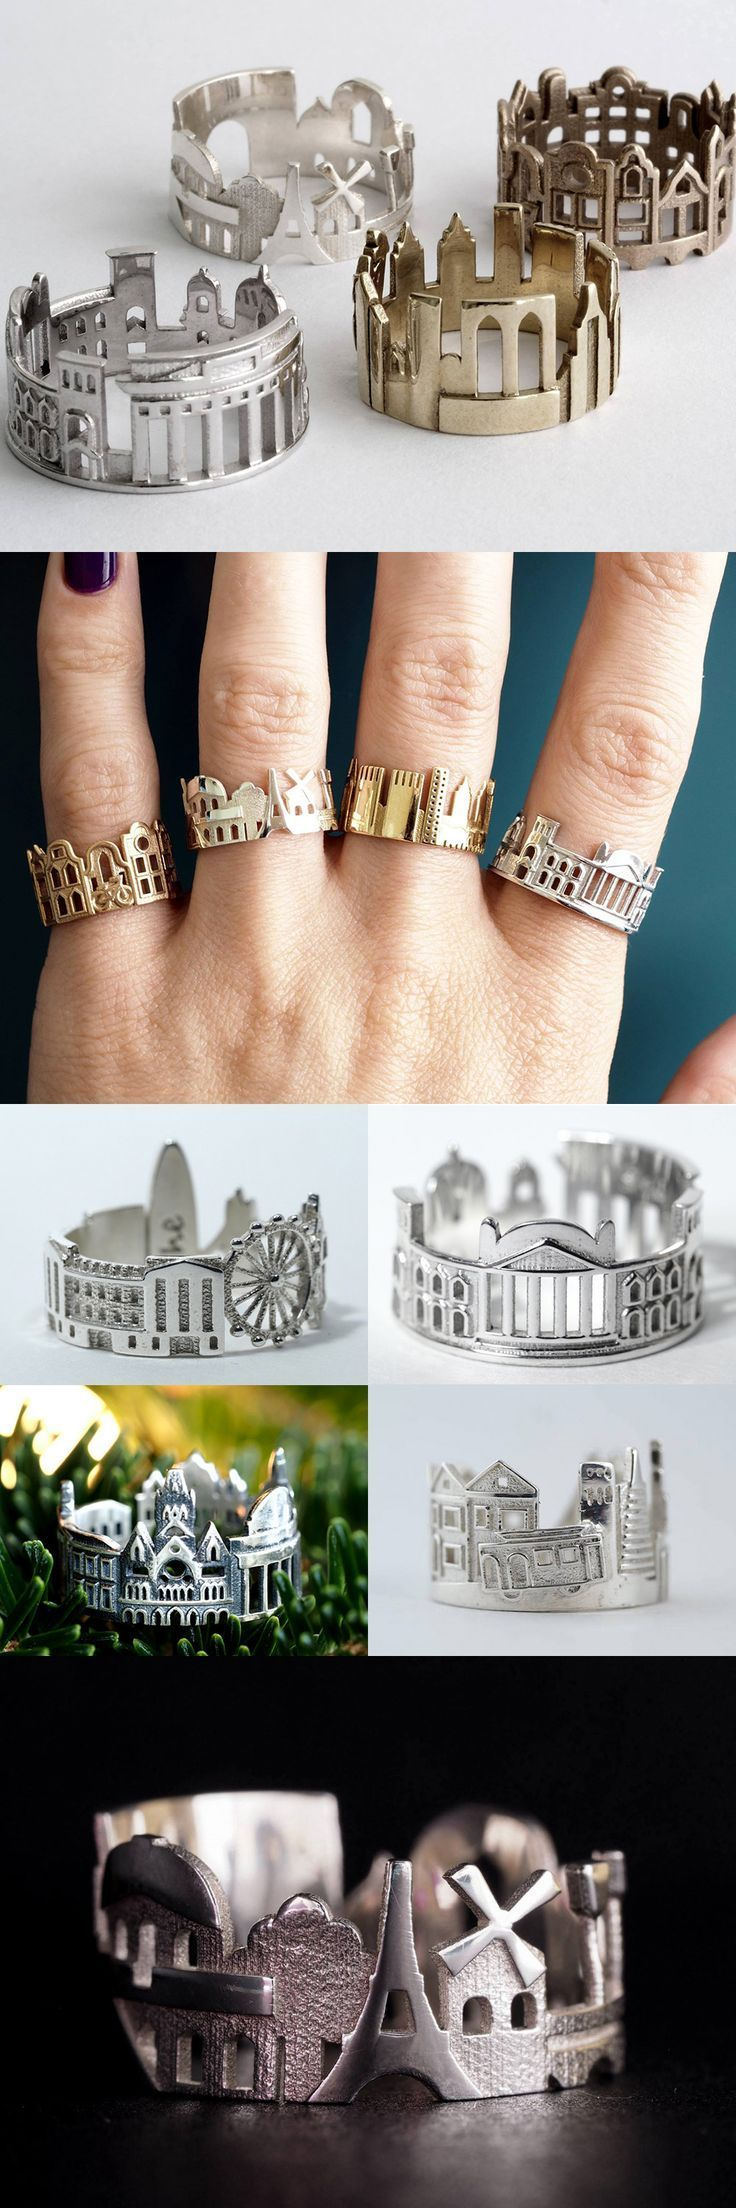 Lista de los anillos de cubo ~ rubies.work / paisaje urbano ... Anillos característica arquitectónica Highli ...